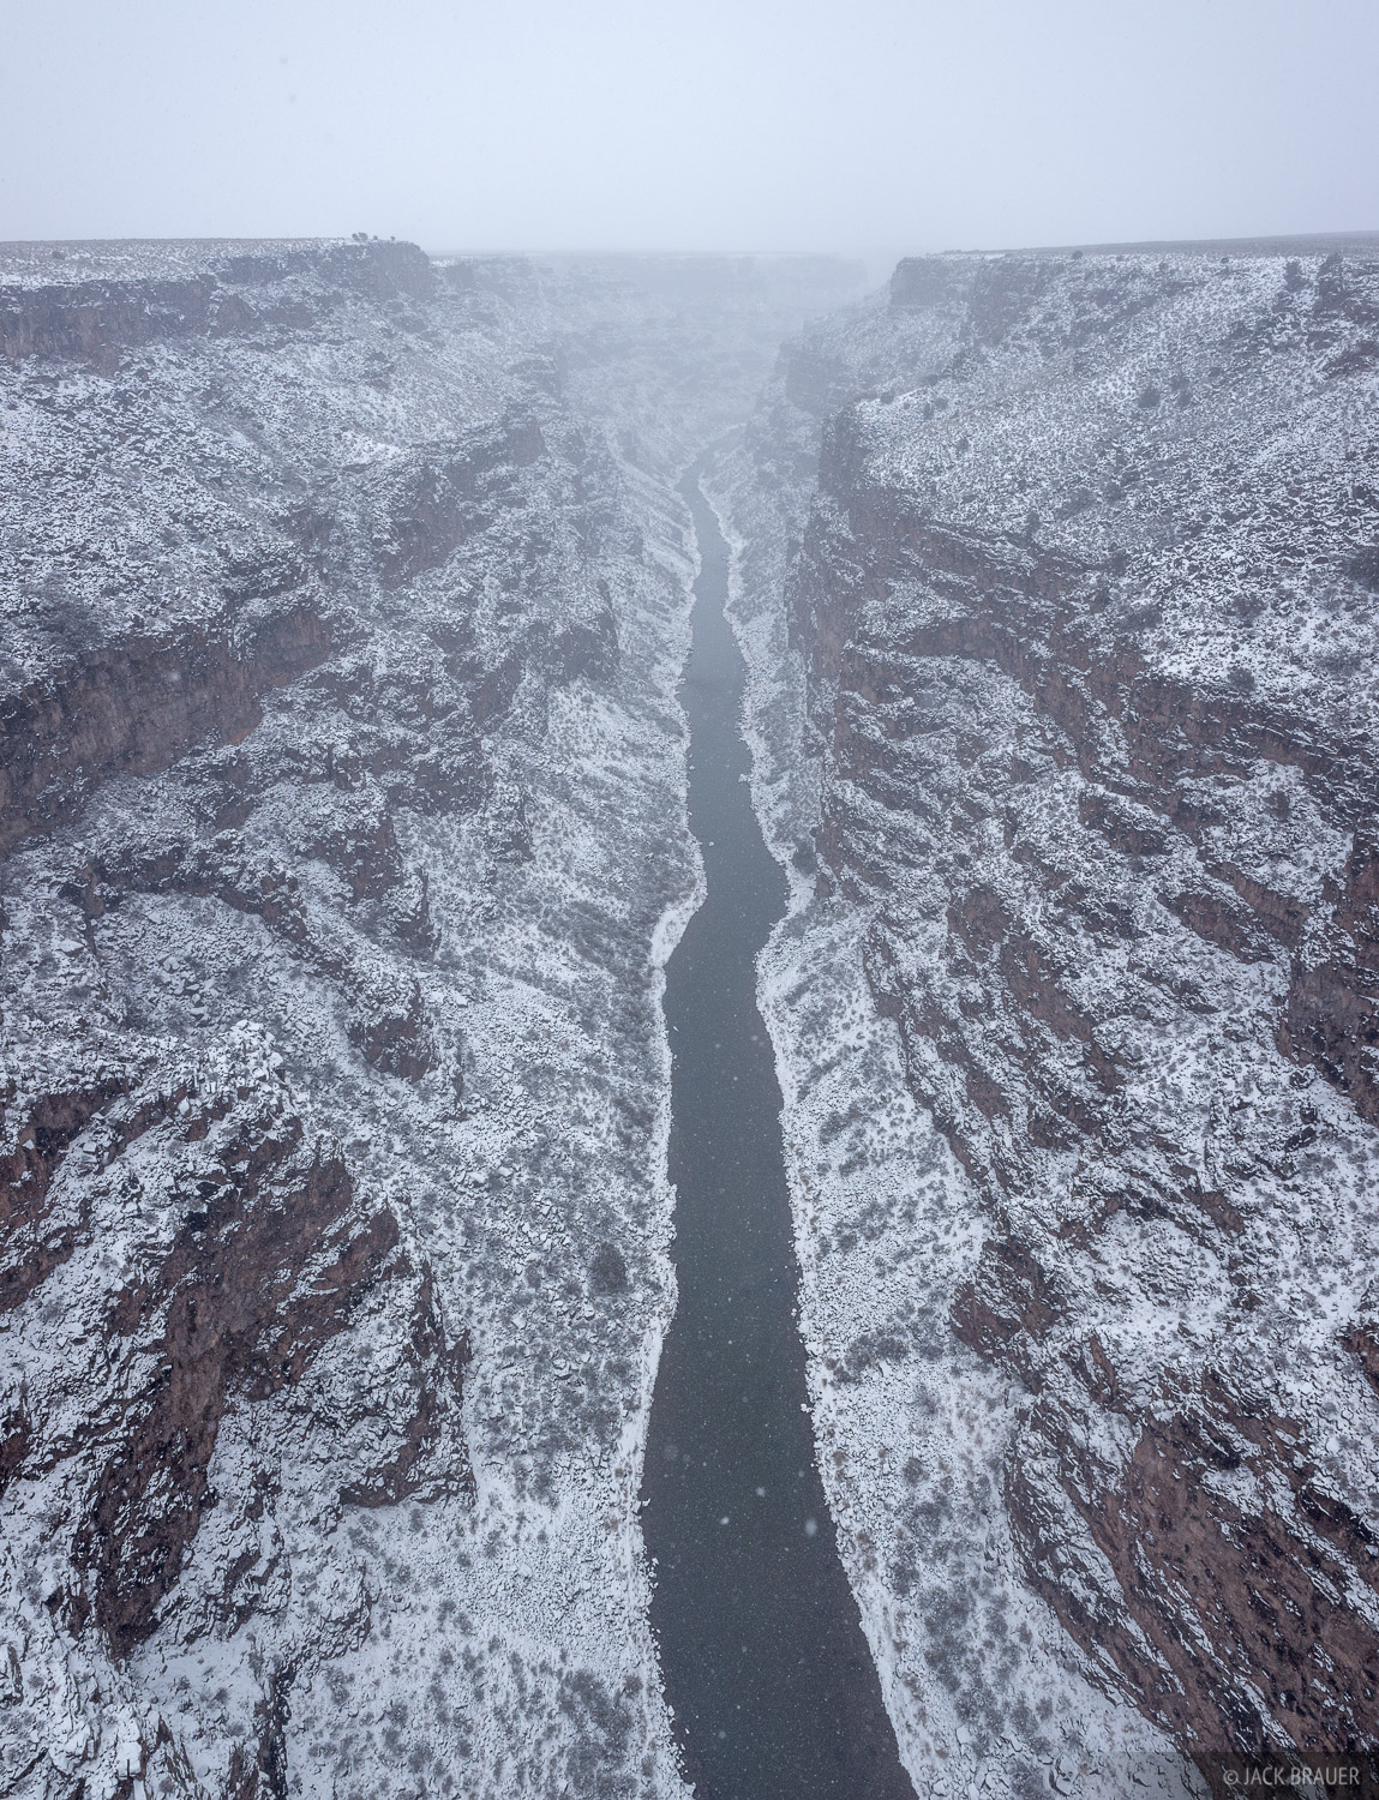 Fresh snow smothers the Rio Grande Gorge near Taos, New Mexico - February.